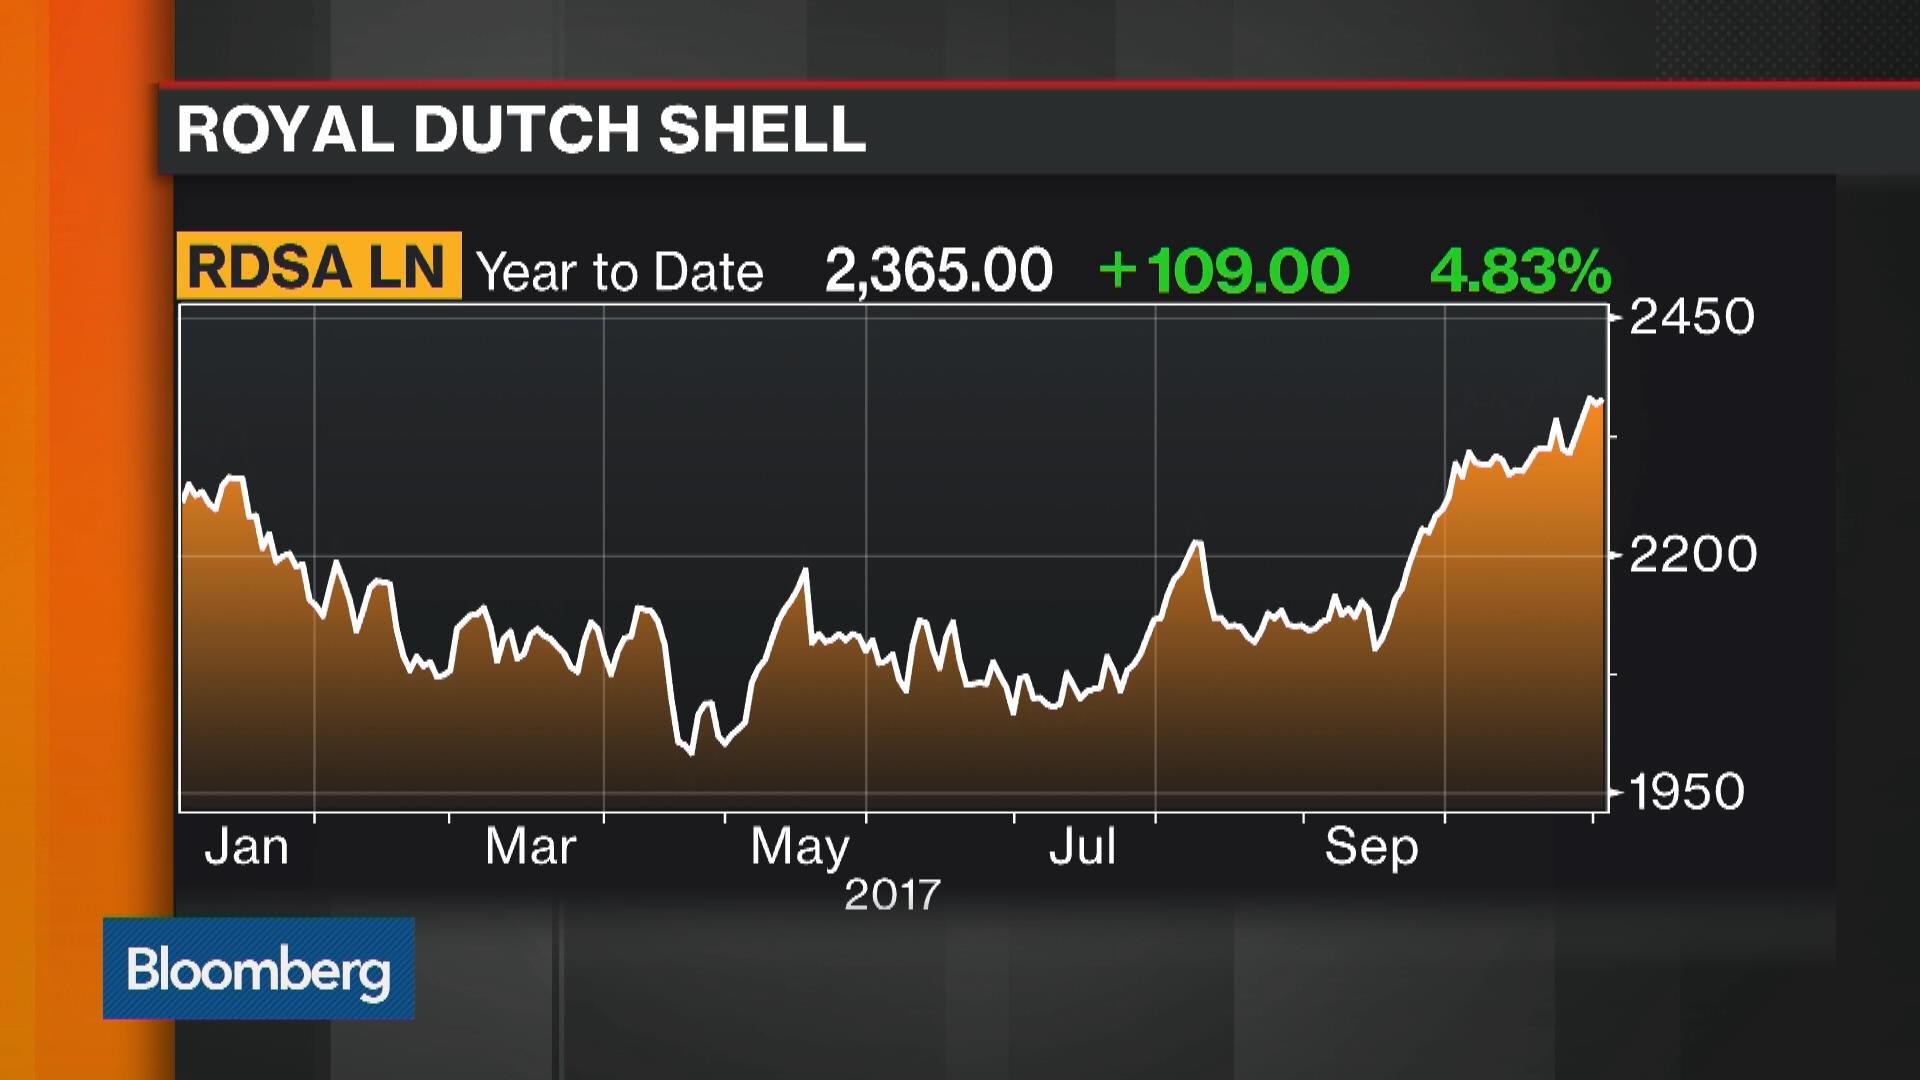 rdsa en amsterdam stock quote royal dutch shell plc bloomberg